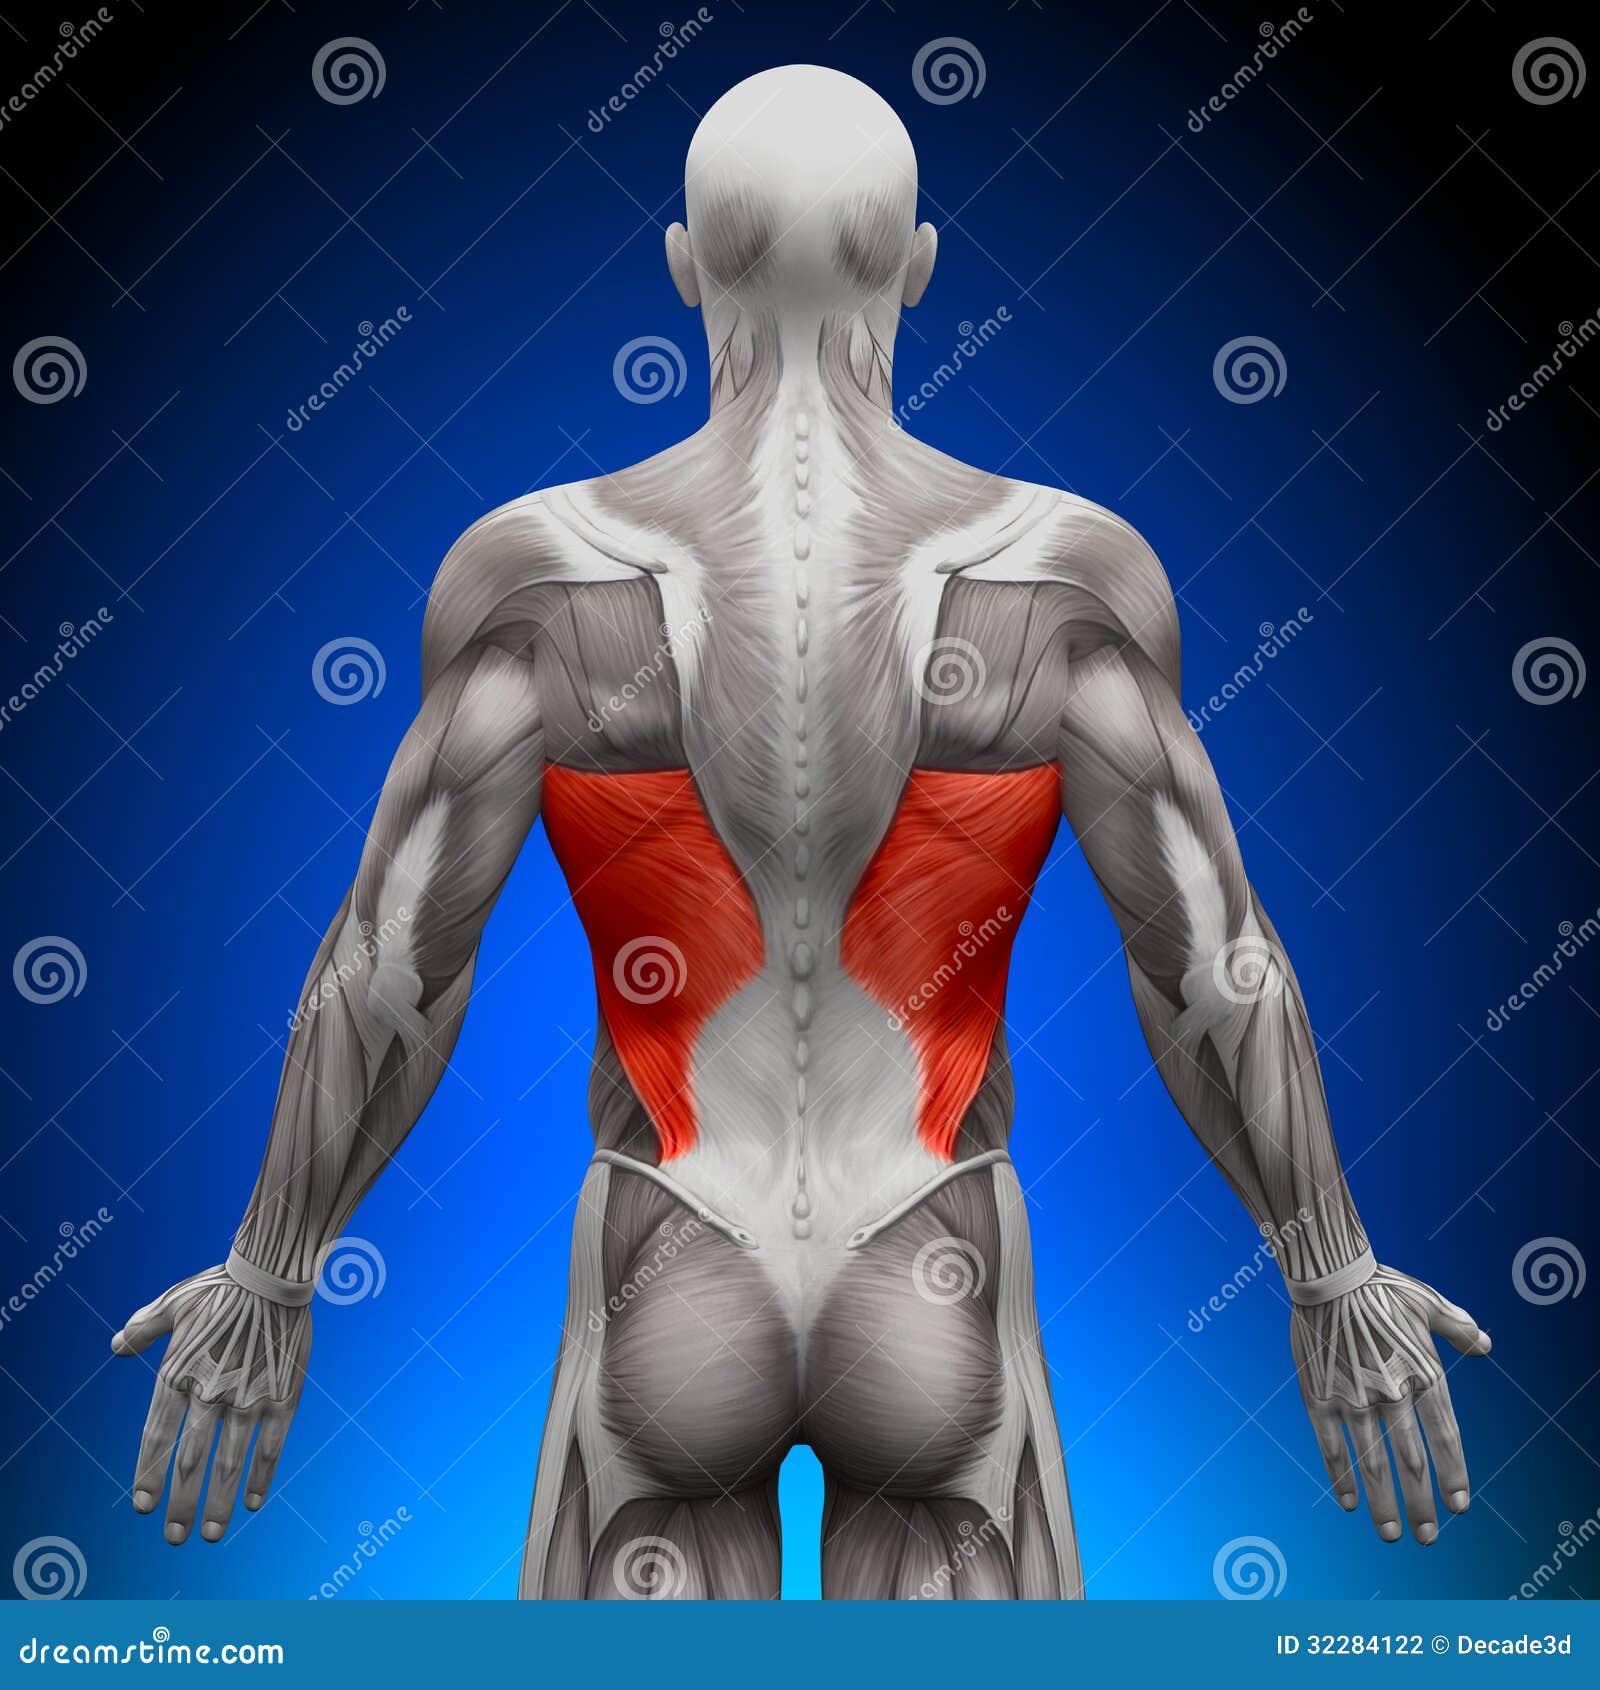 Latissimus Dorsi - Anatomy Muscles Stock Illustration - Illustration ...